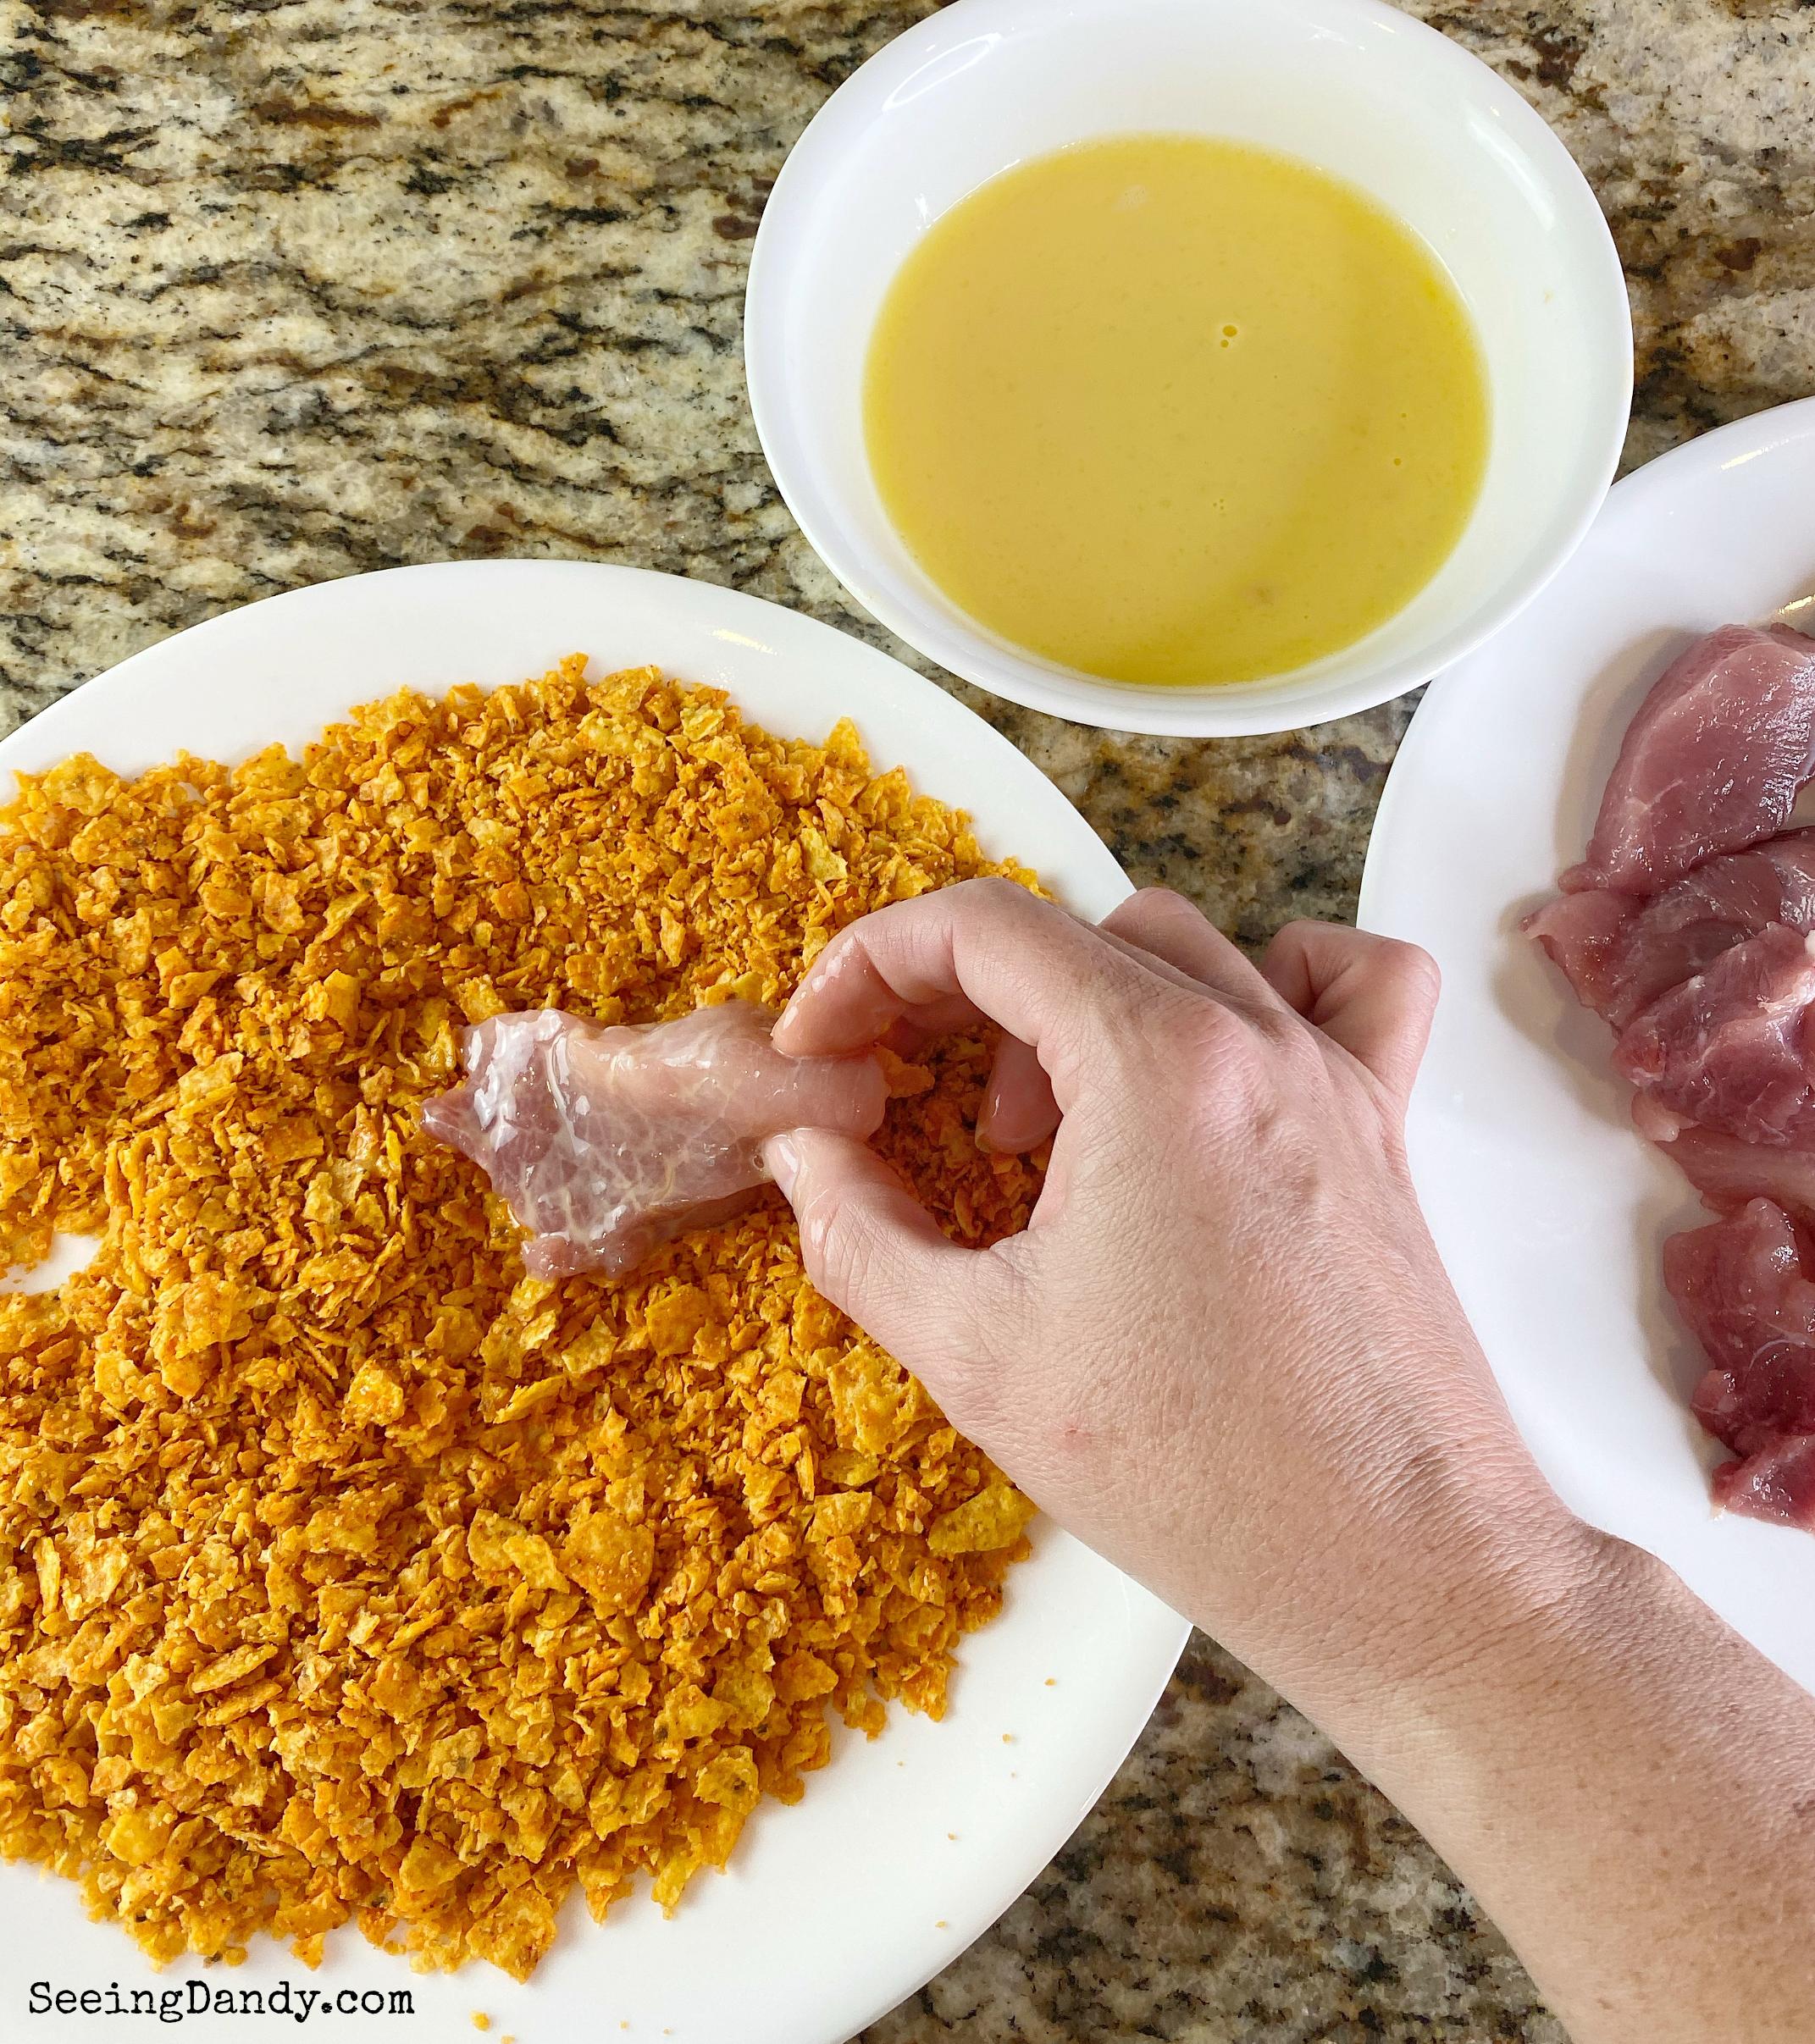 Rolling pork sirloin strips into crushed Doritos.